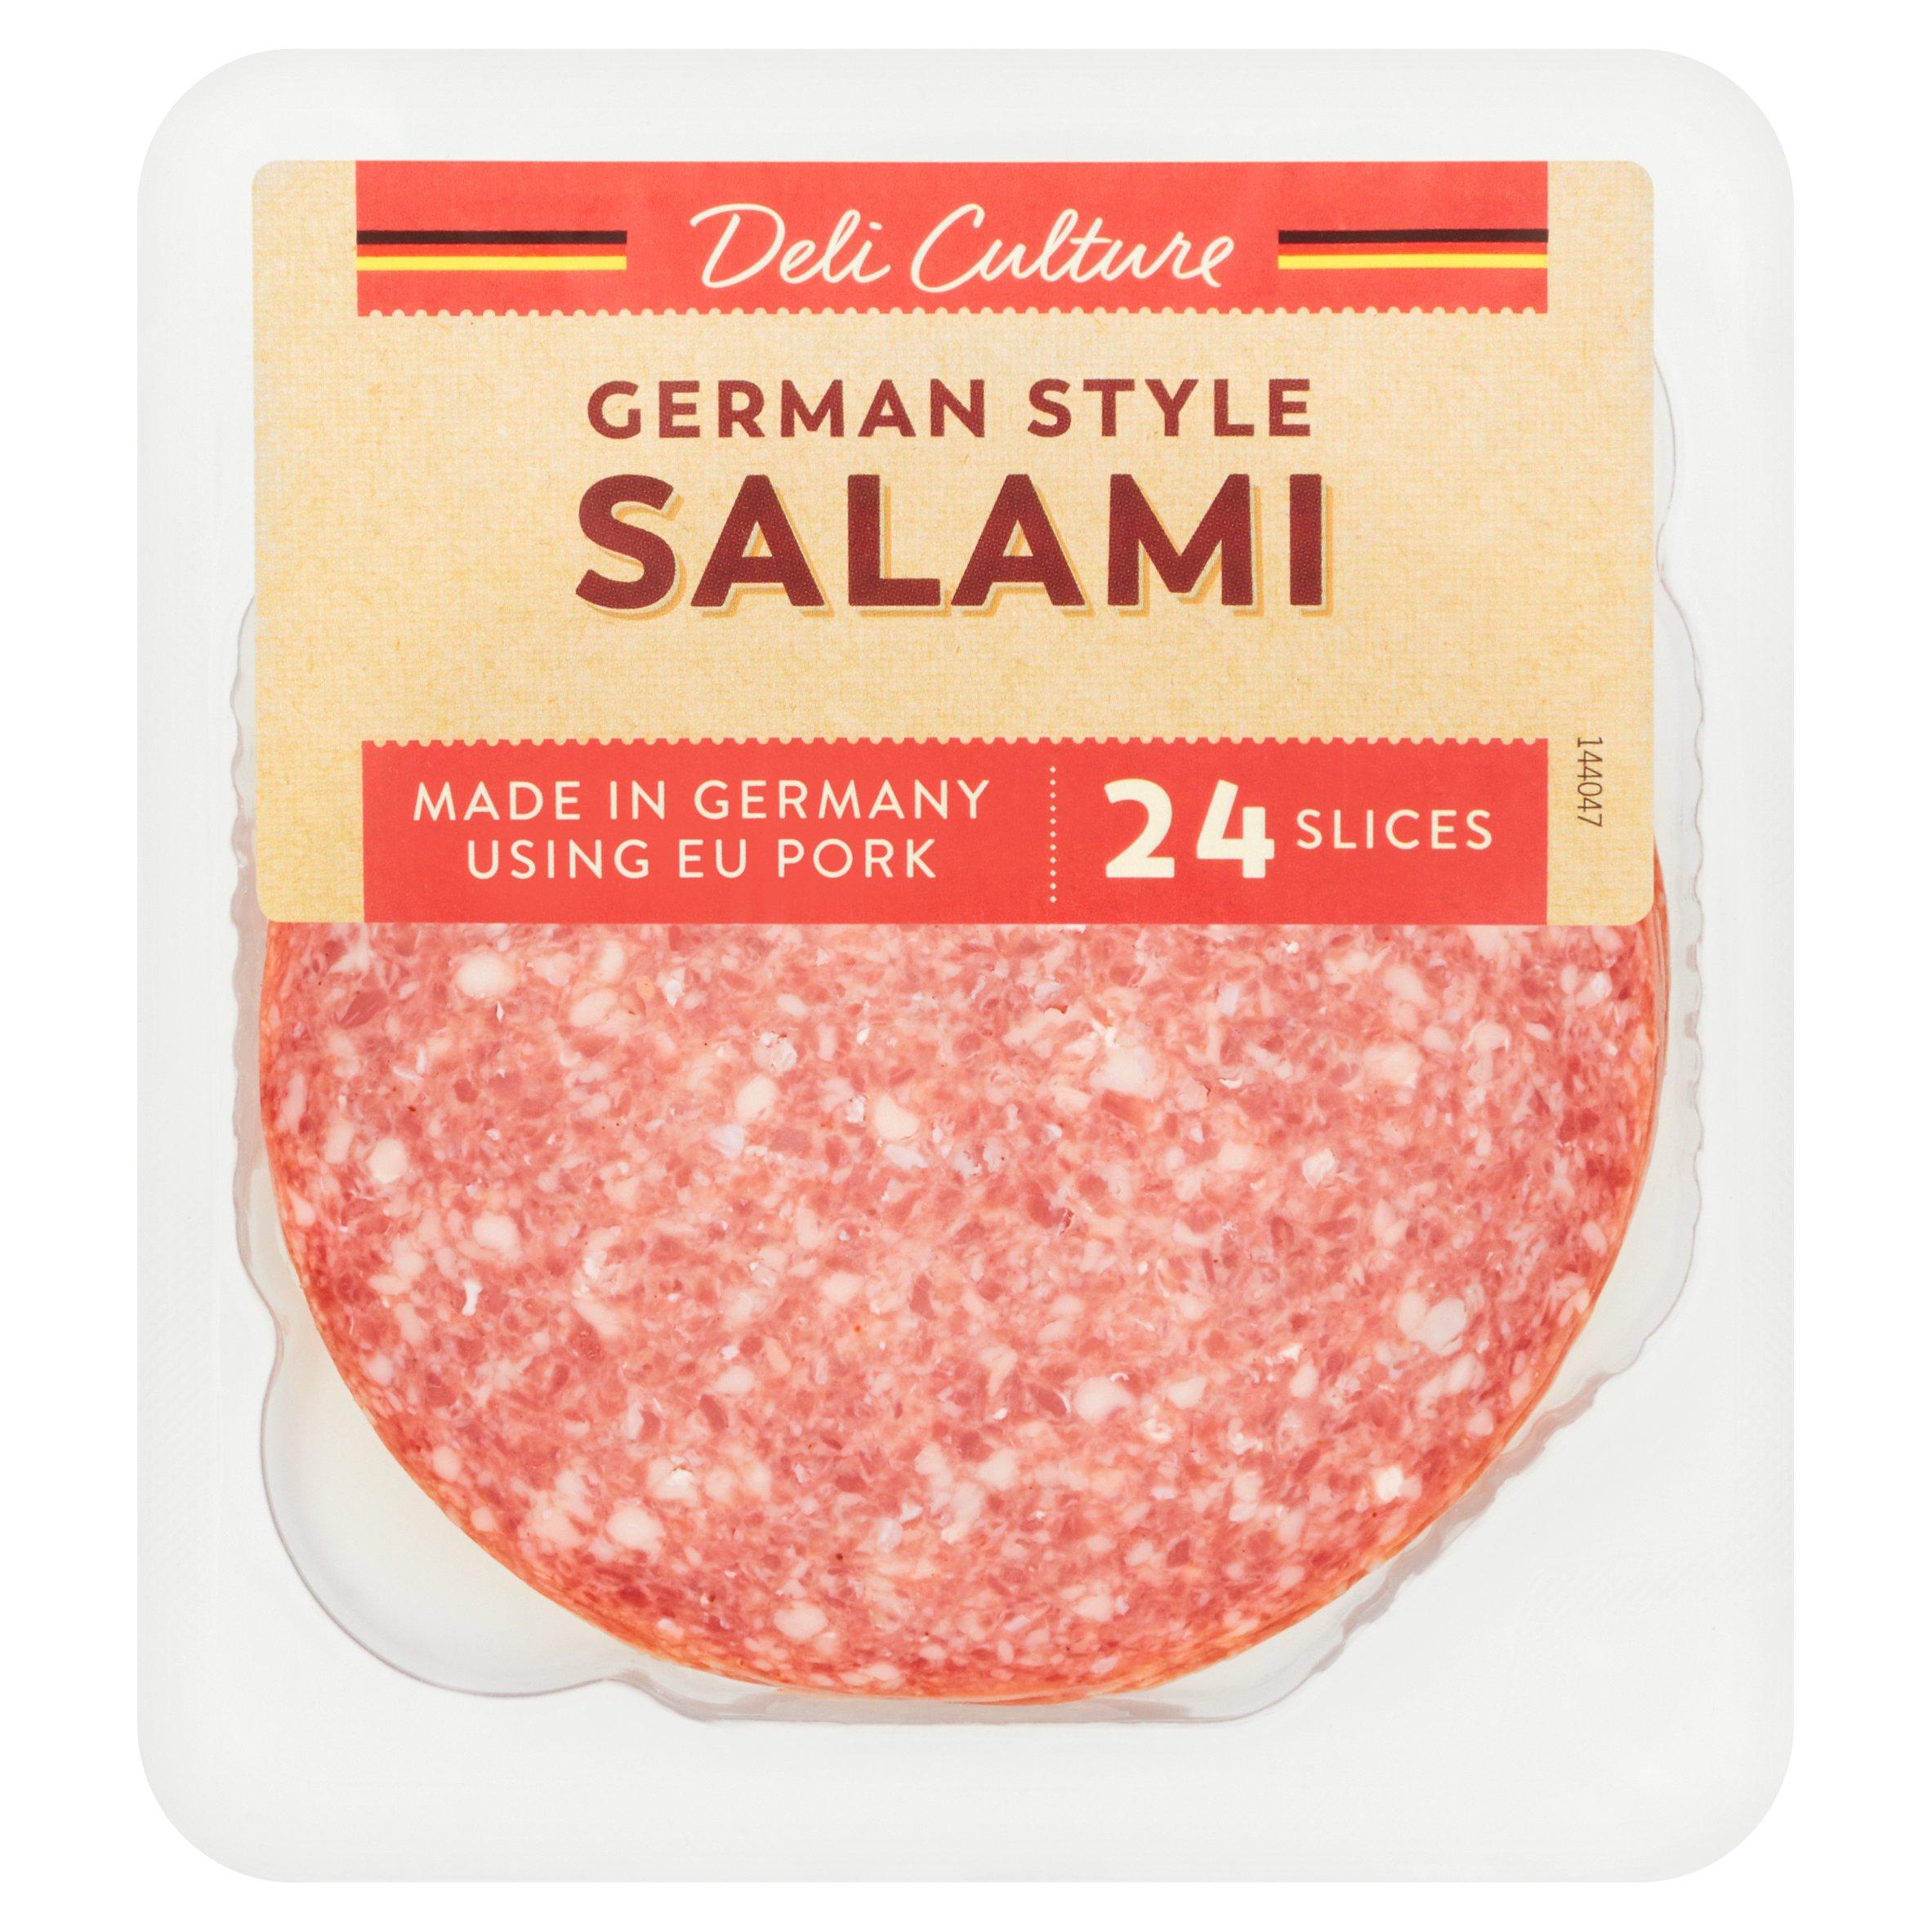 Deli Culture German Salami 24 Slices 250G